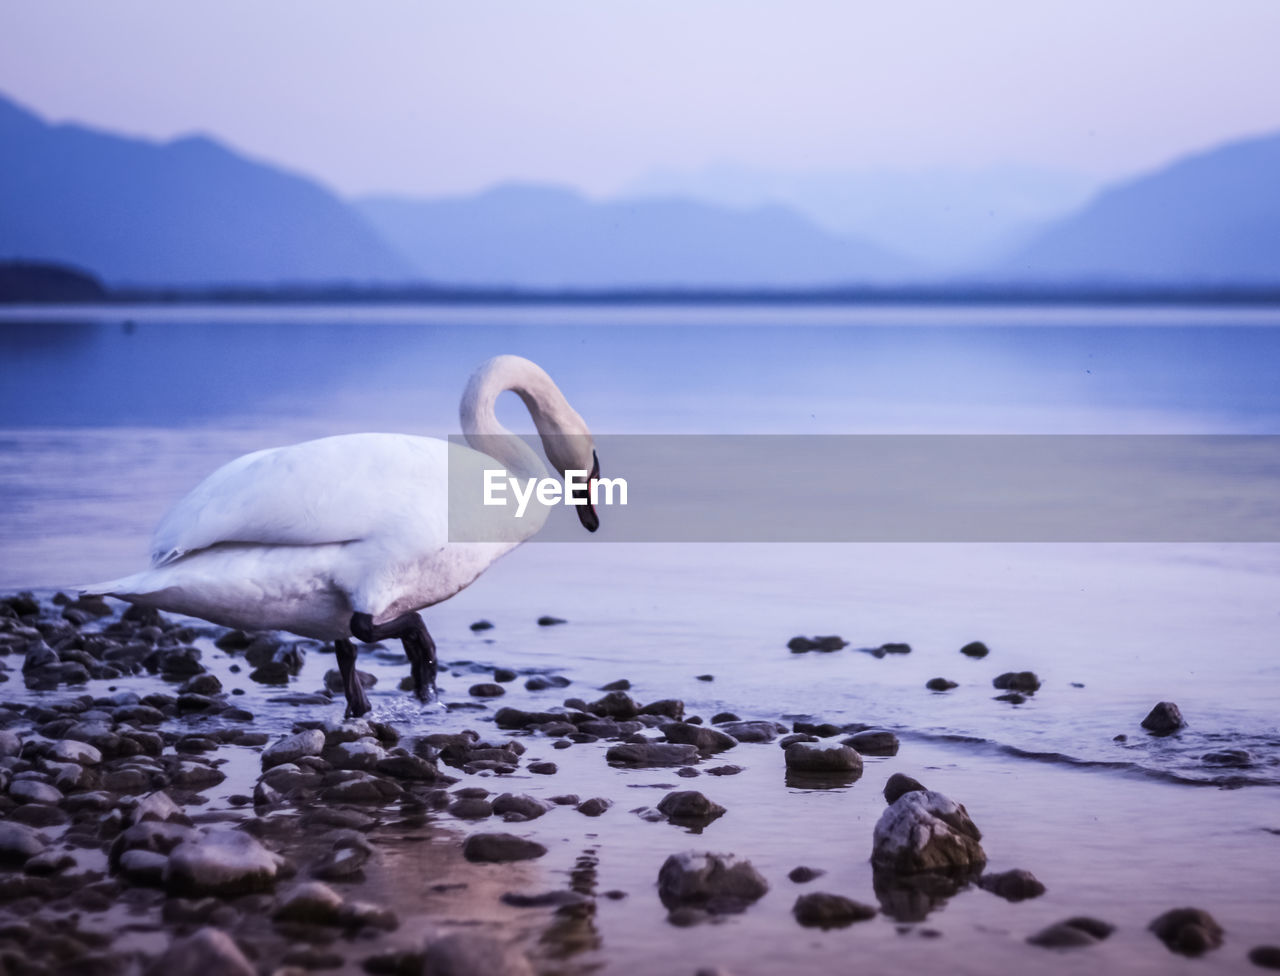 VIEW OF BIRD ON ROCK AT LAKE